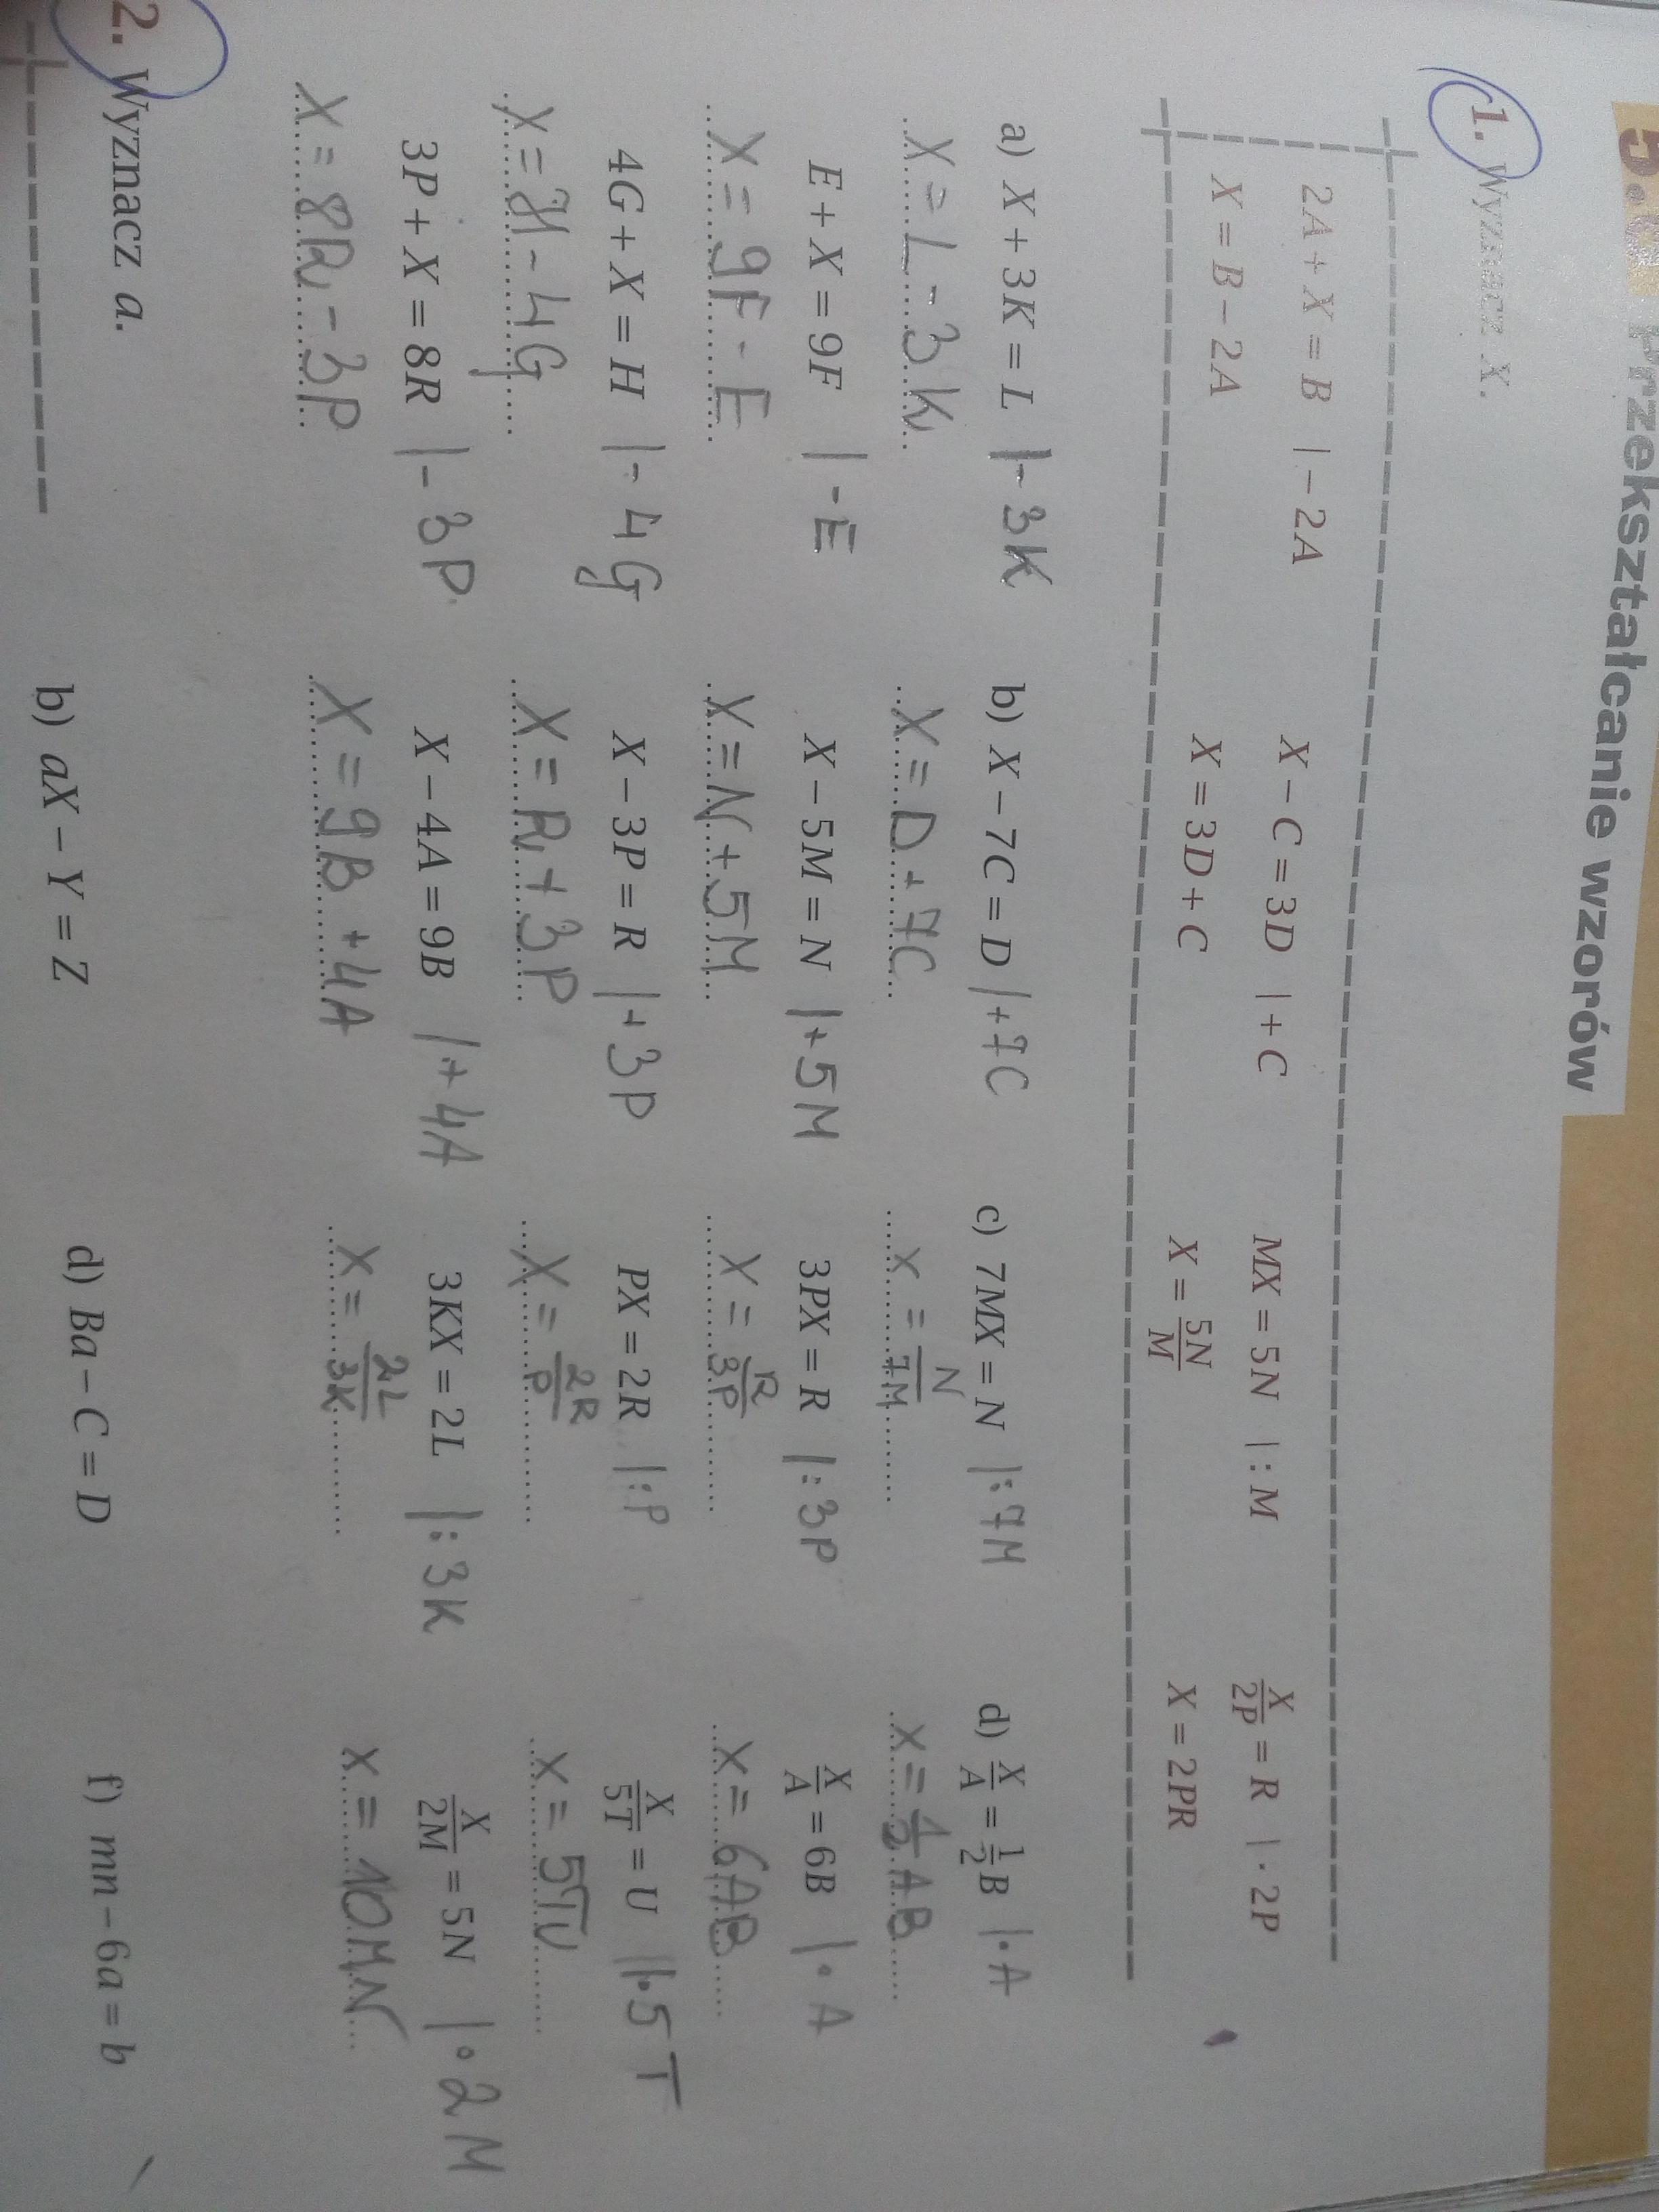 �9ᢹ�9f�x�r[��x��_Wyznaczx.a)X+3K=LE+X=9F4G+X=H3P+X=8Rb)X-7C=DX-5M=NX-3P=R-Brainly.pl